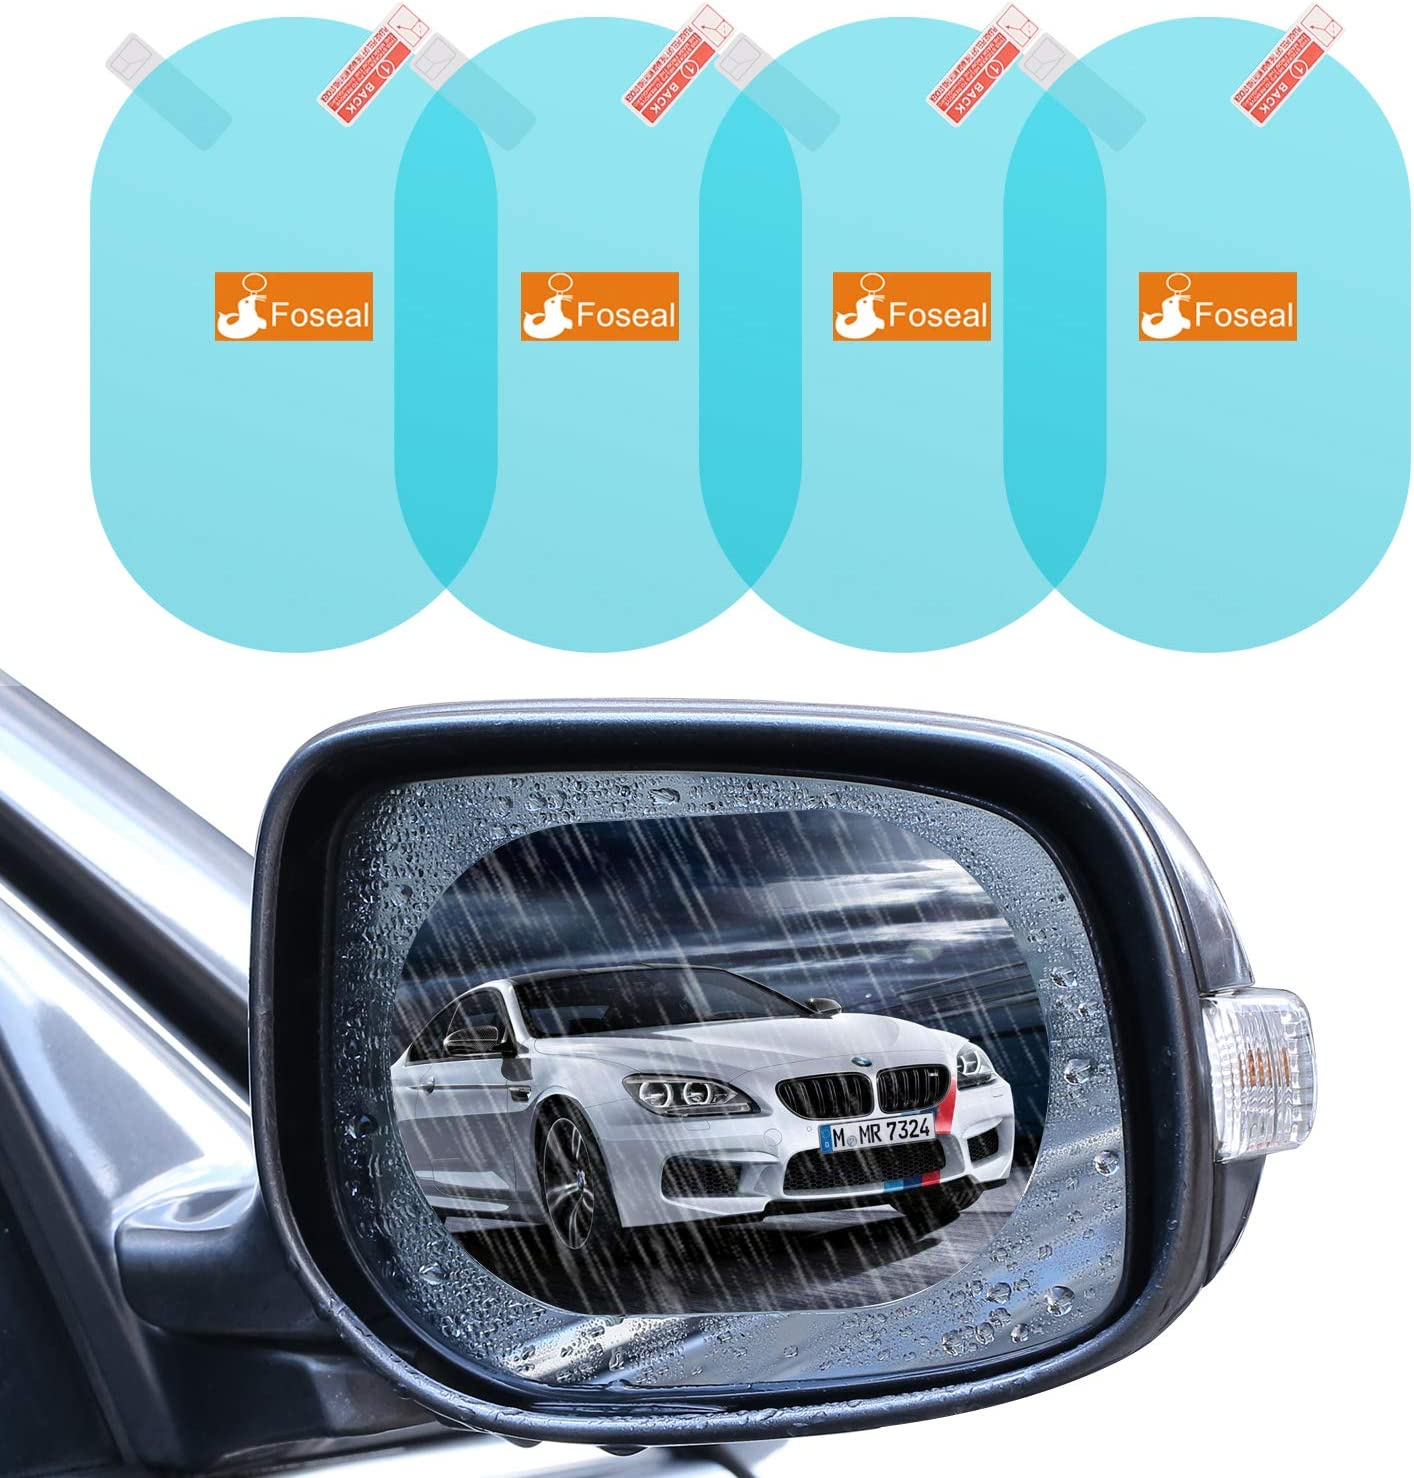 Full Screen Anti-Fog Nano Waterproof Film Side Window Hd Water Repellent Film Reversing Mirror XINdream Car Rear View Mirror Rainproof Film